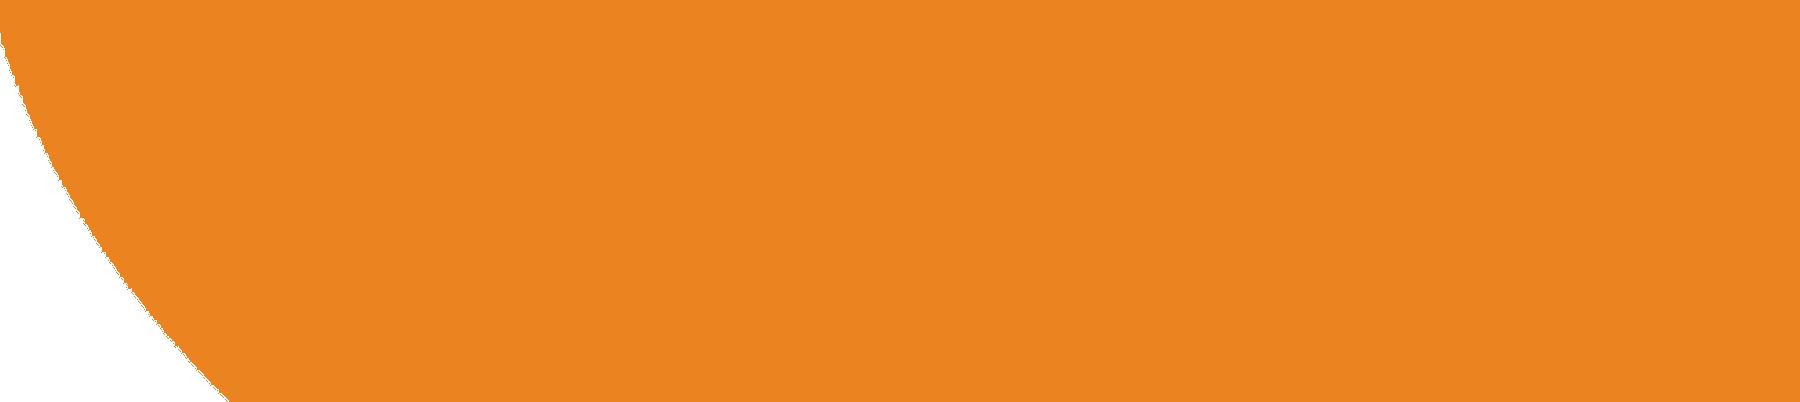 orange-bar-from-right-fw